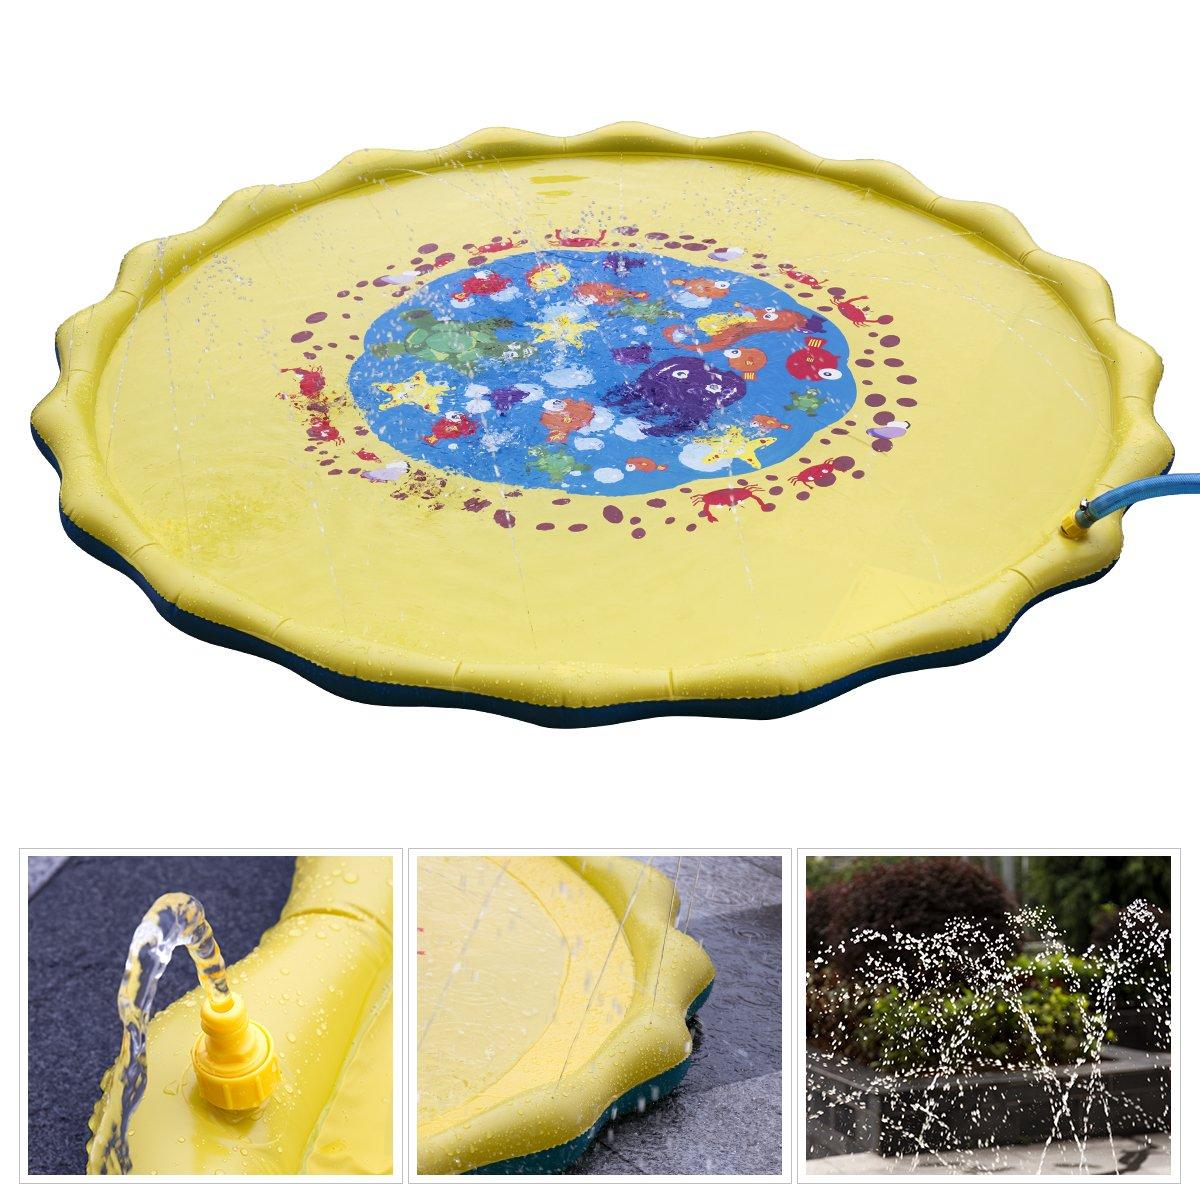 HALOFUN 67in-Diameter Sprinkle and Splash Play Mat for Kids (Yellow) by HALOFUN (Image #3)